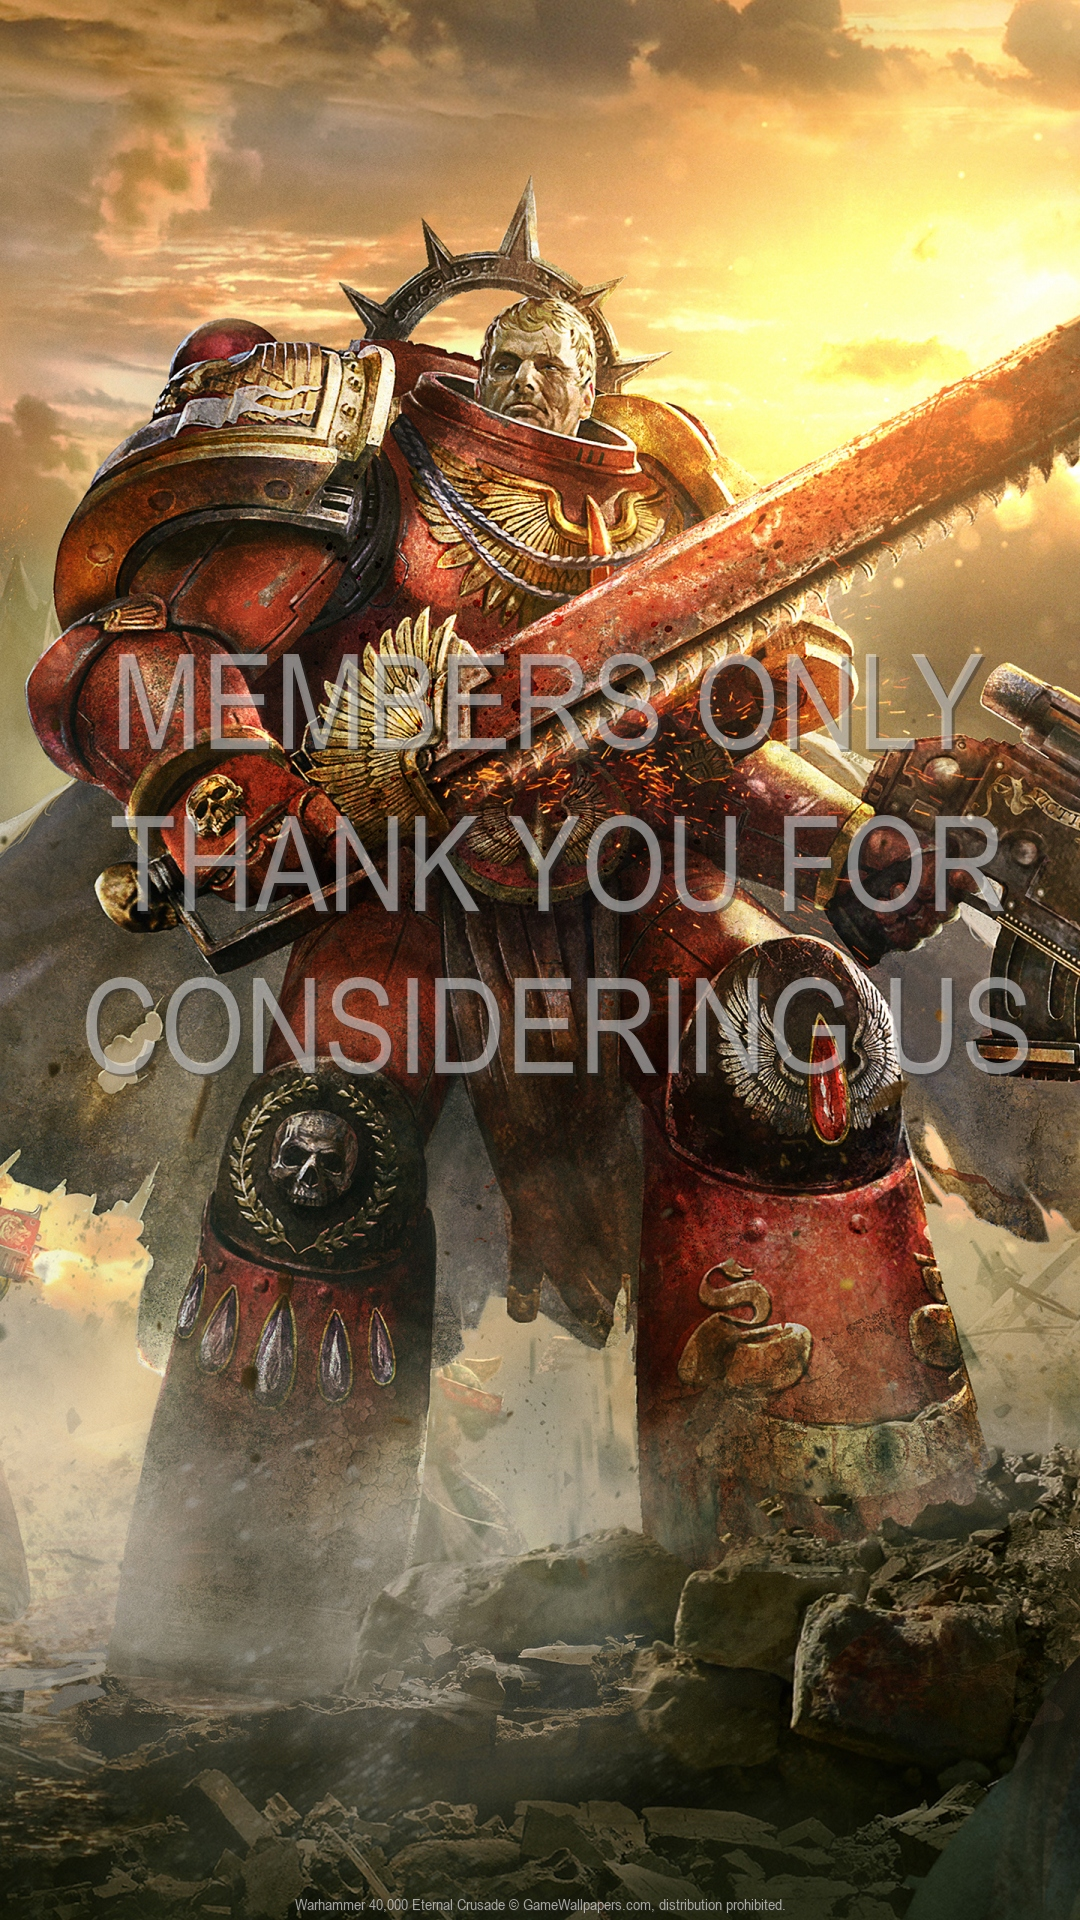 Warhammer 40,000: Eternal Crusade 1920x1080 Móvil fondo de escritorio 02